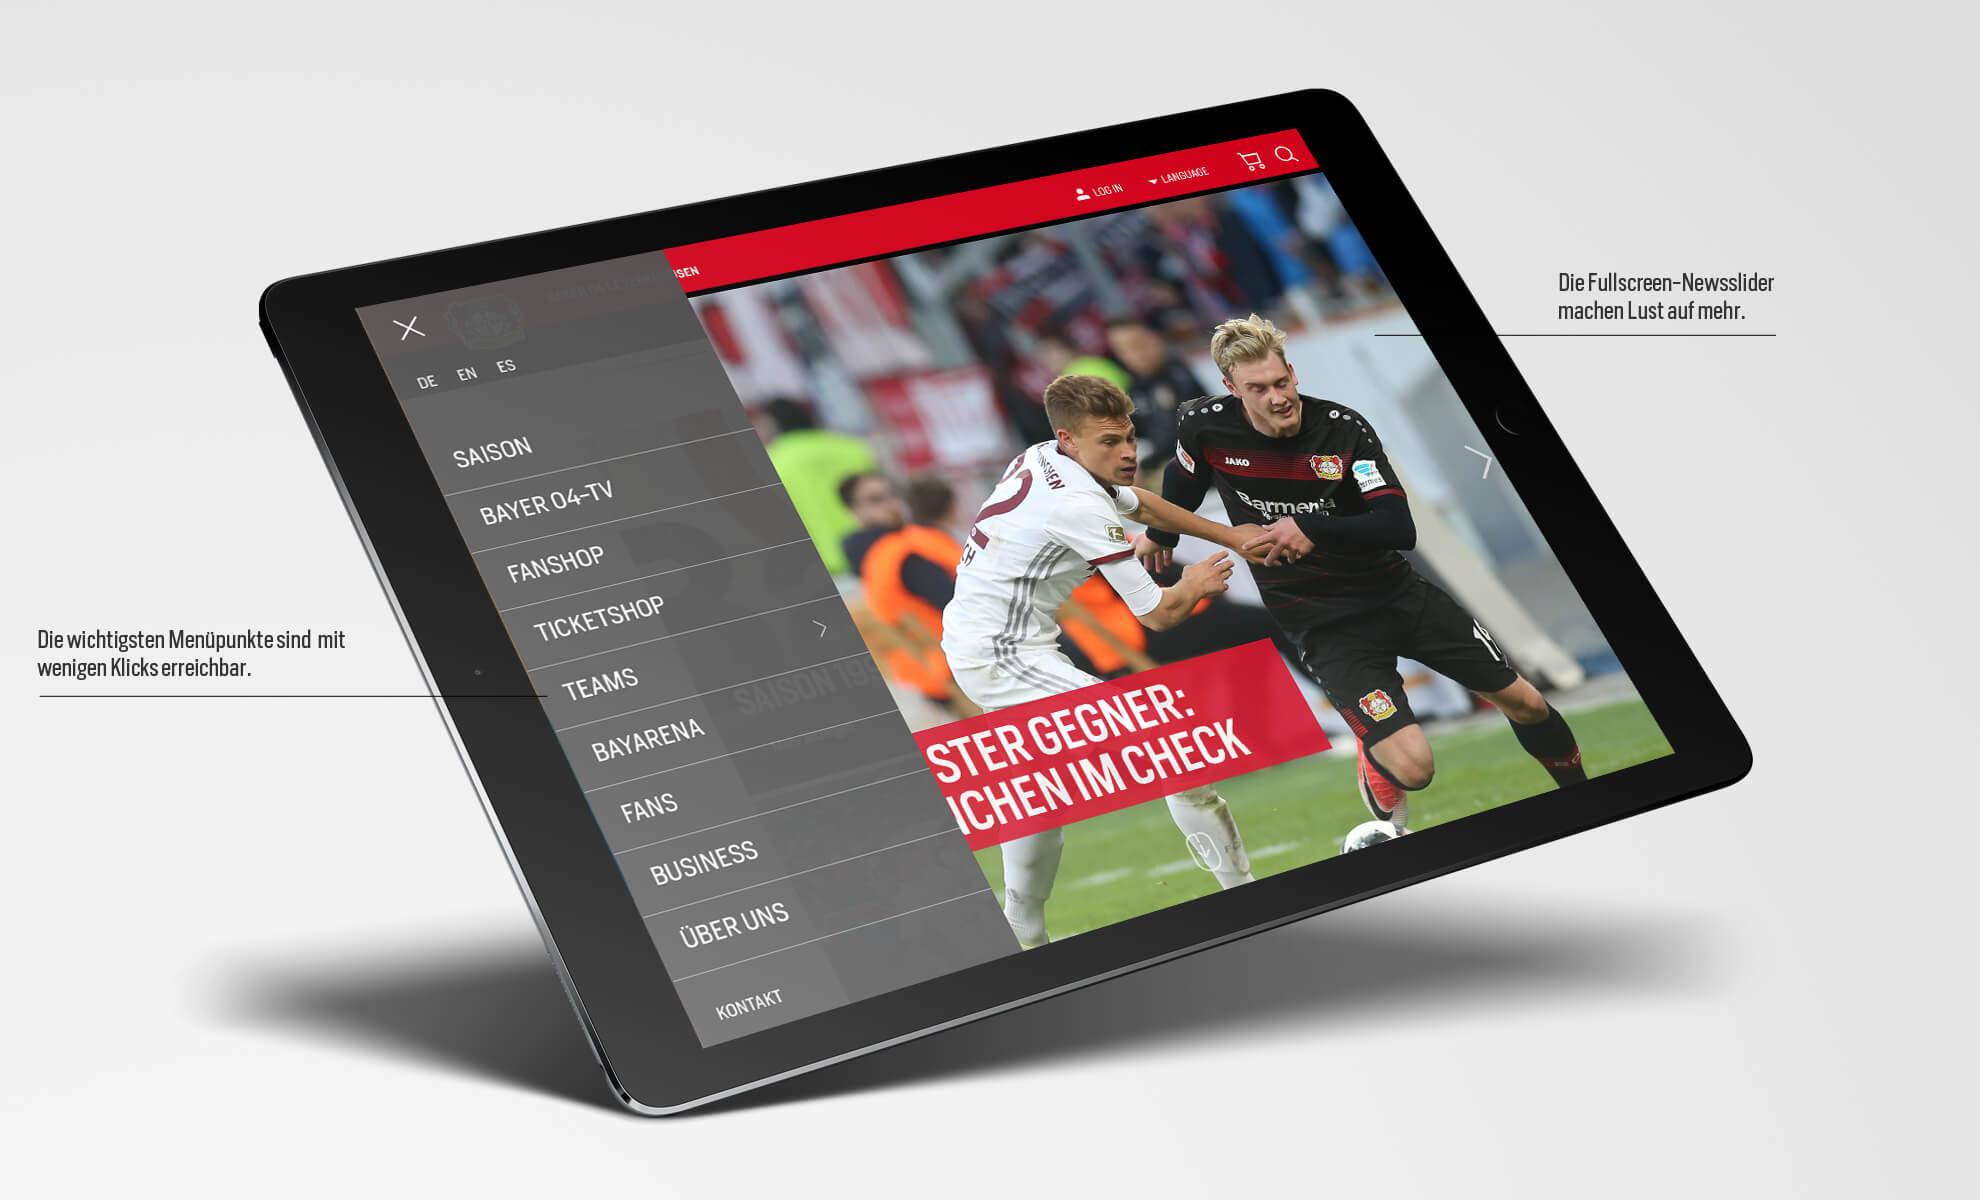 Bayer 04 Leverkusen Website, Relaunch, Redesign, Webdesign, UX, UI, ipad, Hamburgermenü